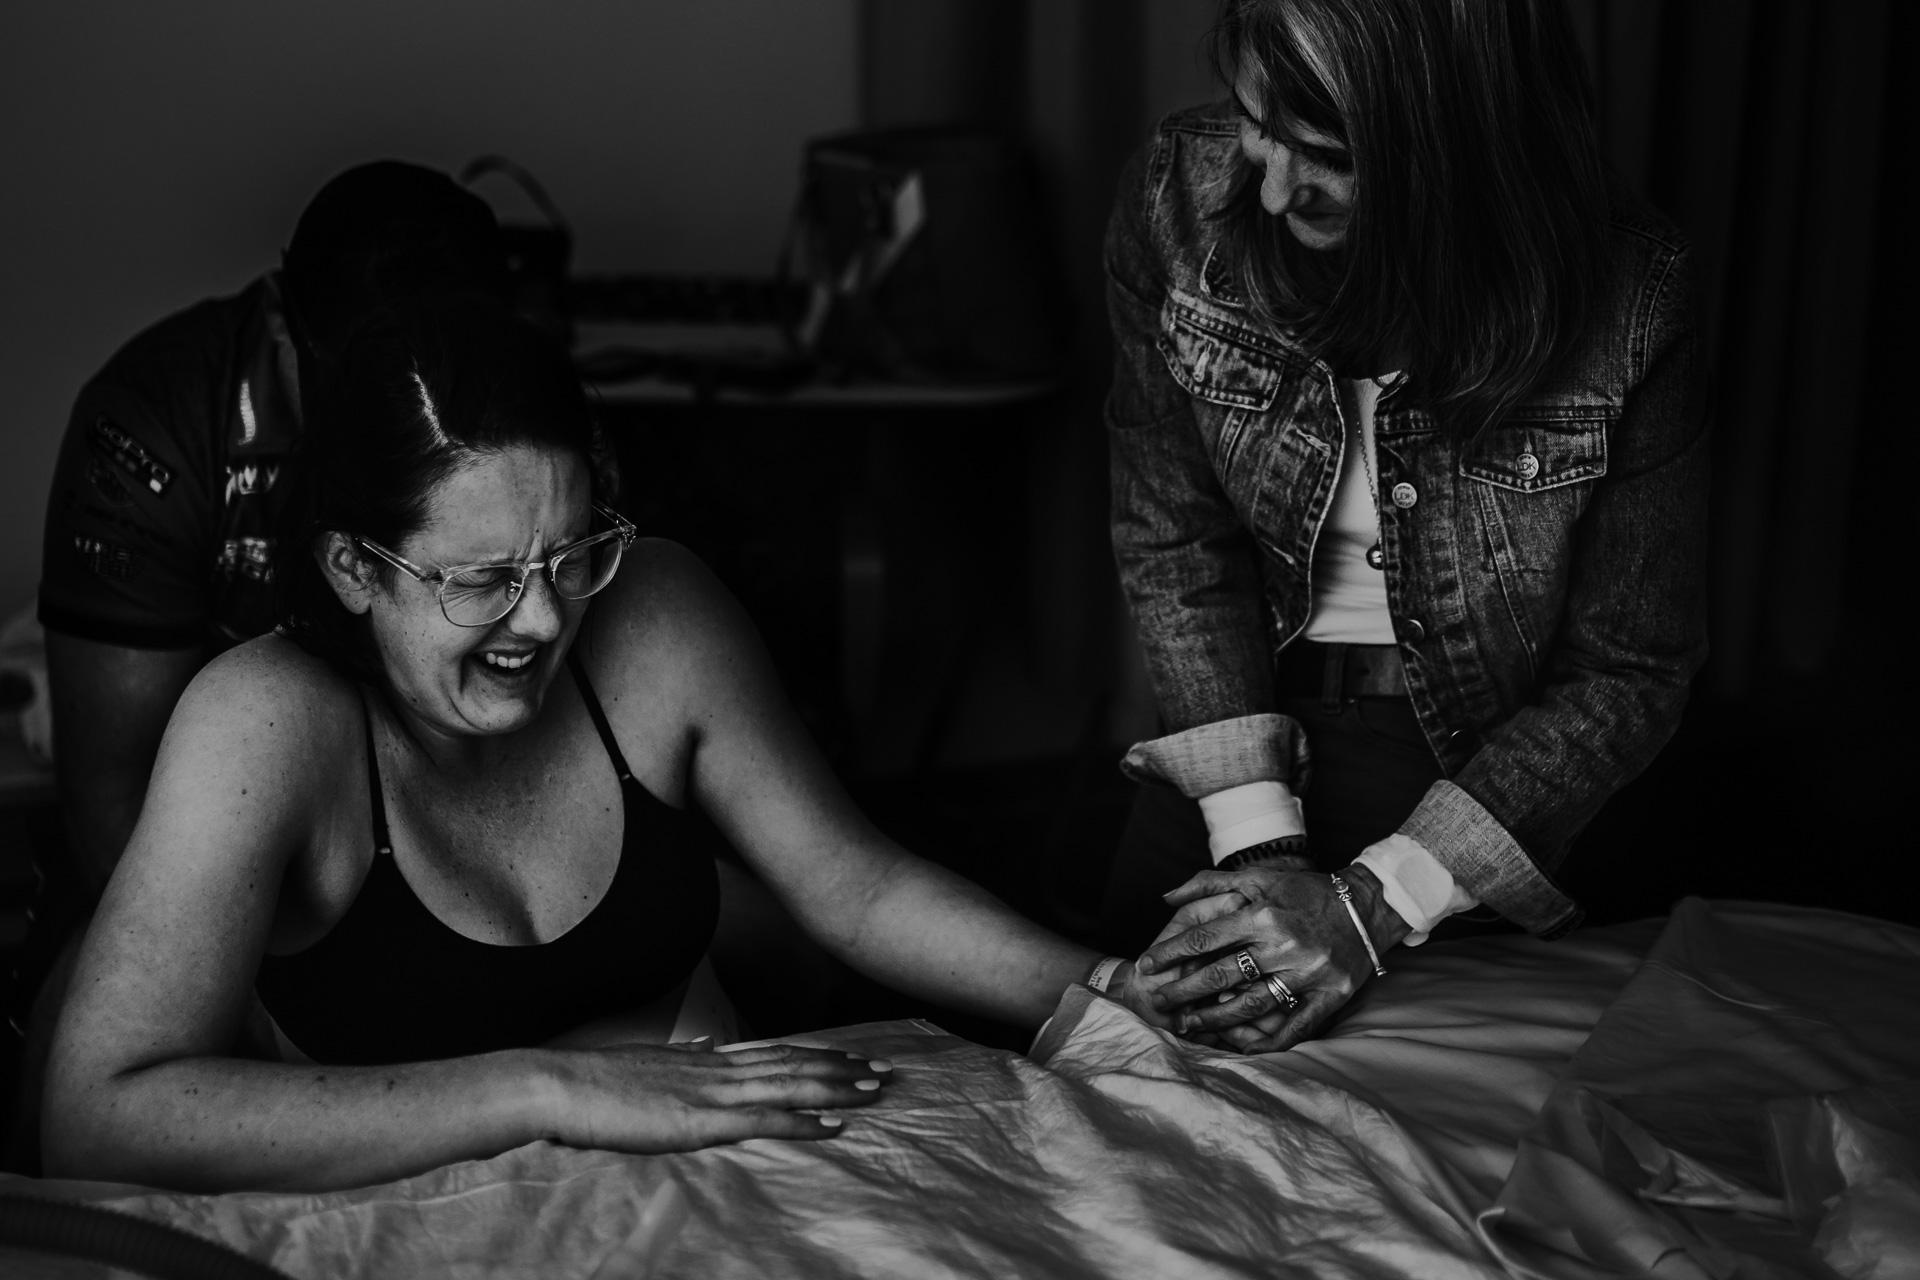 LDP_5620Townsville-Queensland-Australian-Birth-and-Fresh-48-Newborn-Hospital-Photographer.jpg